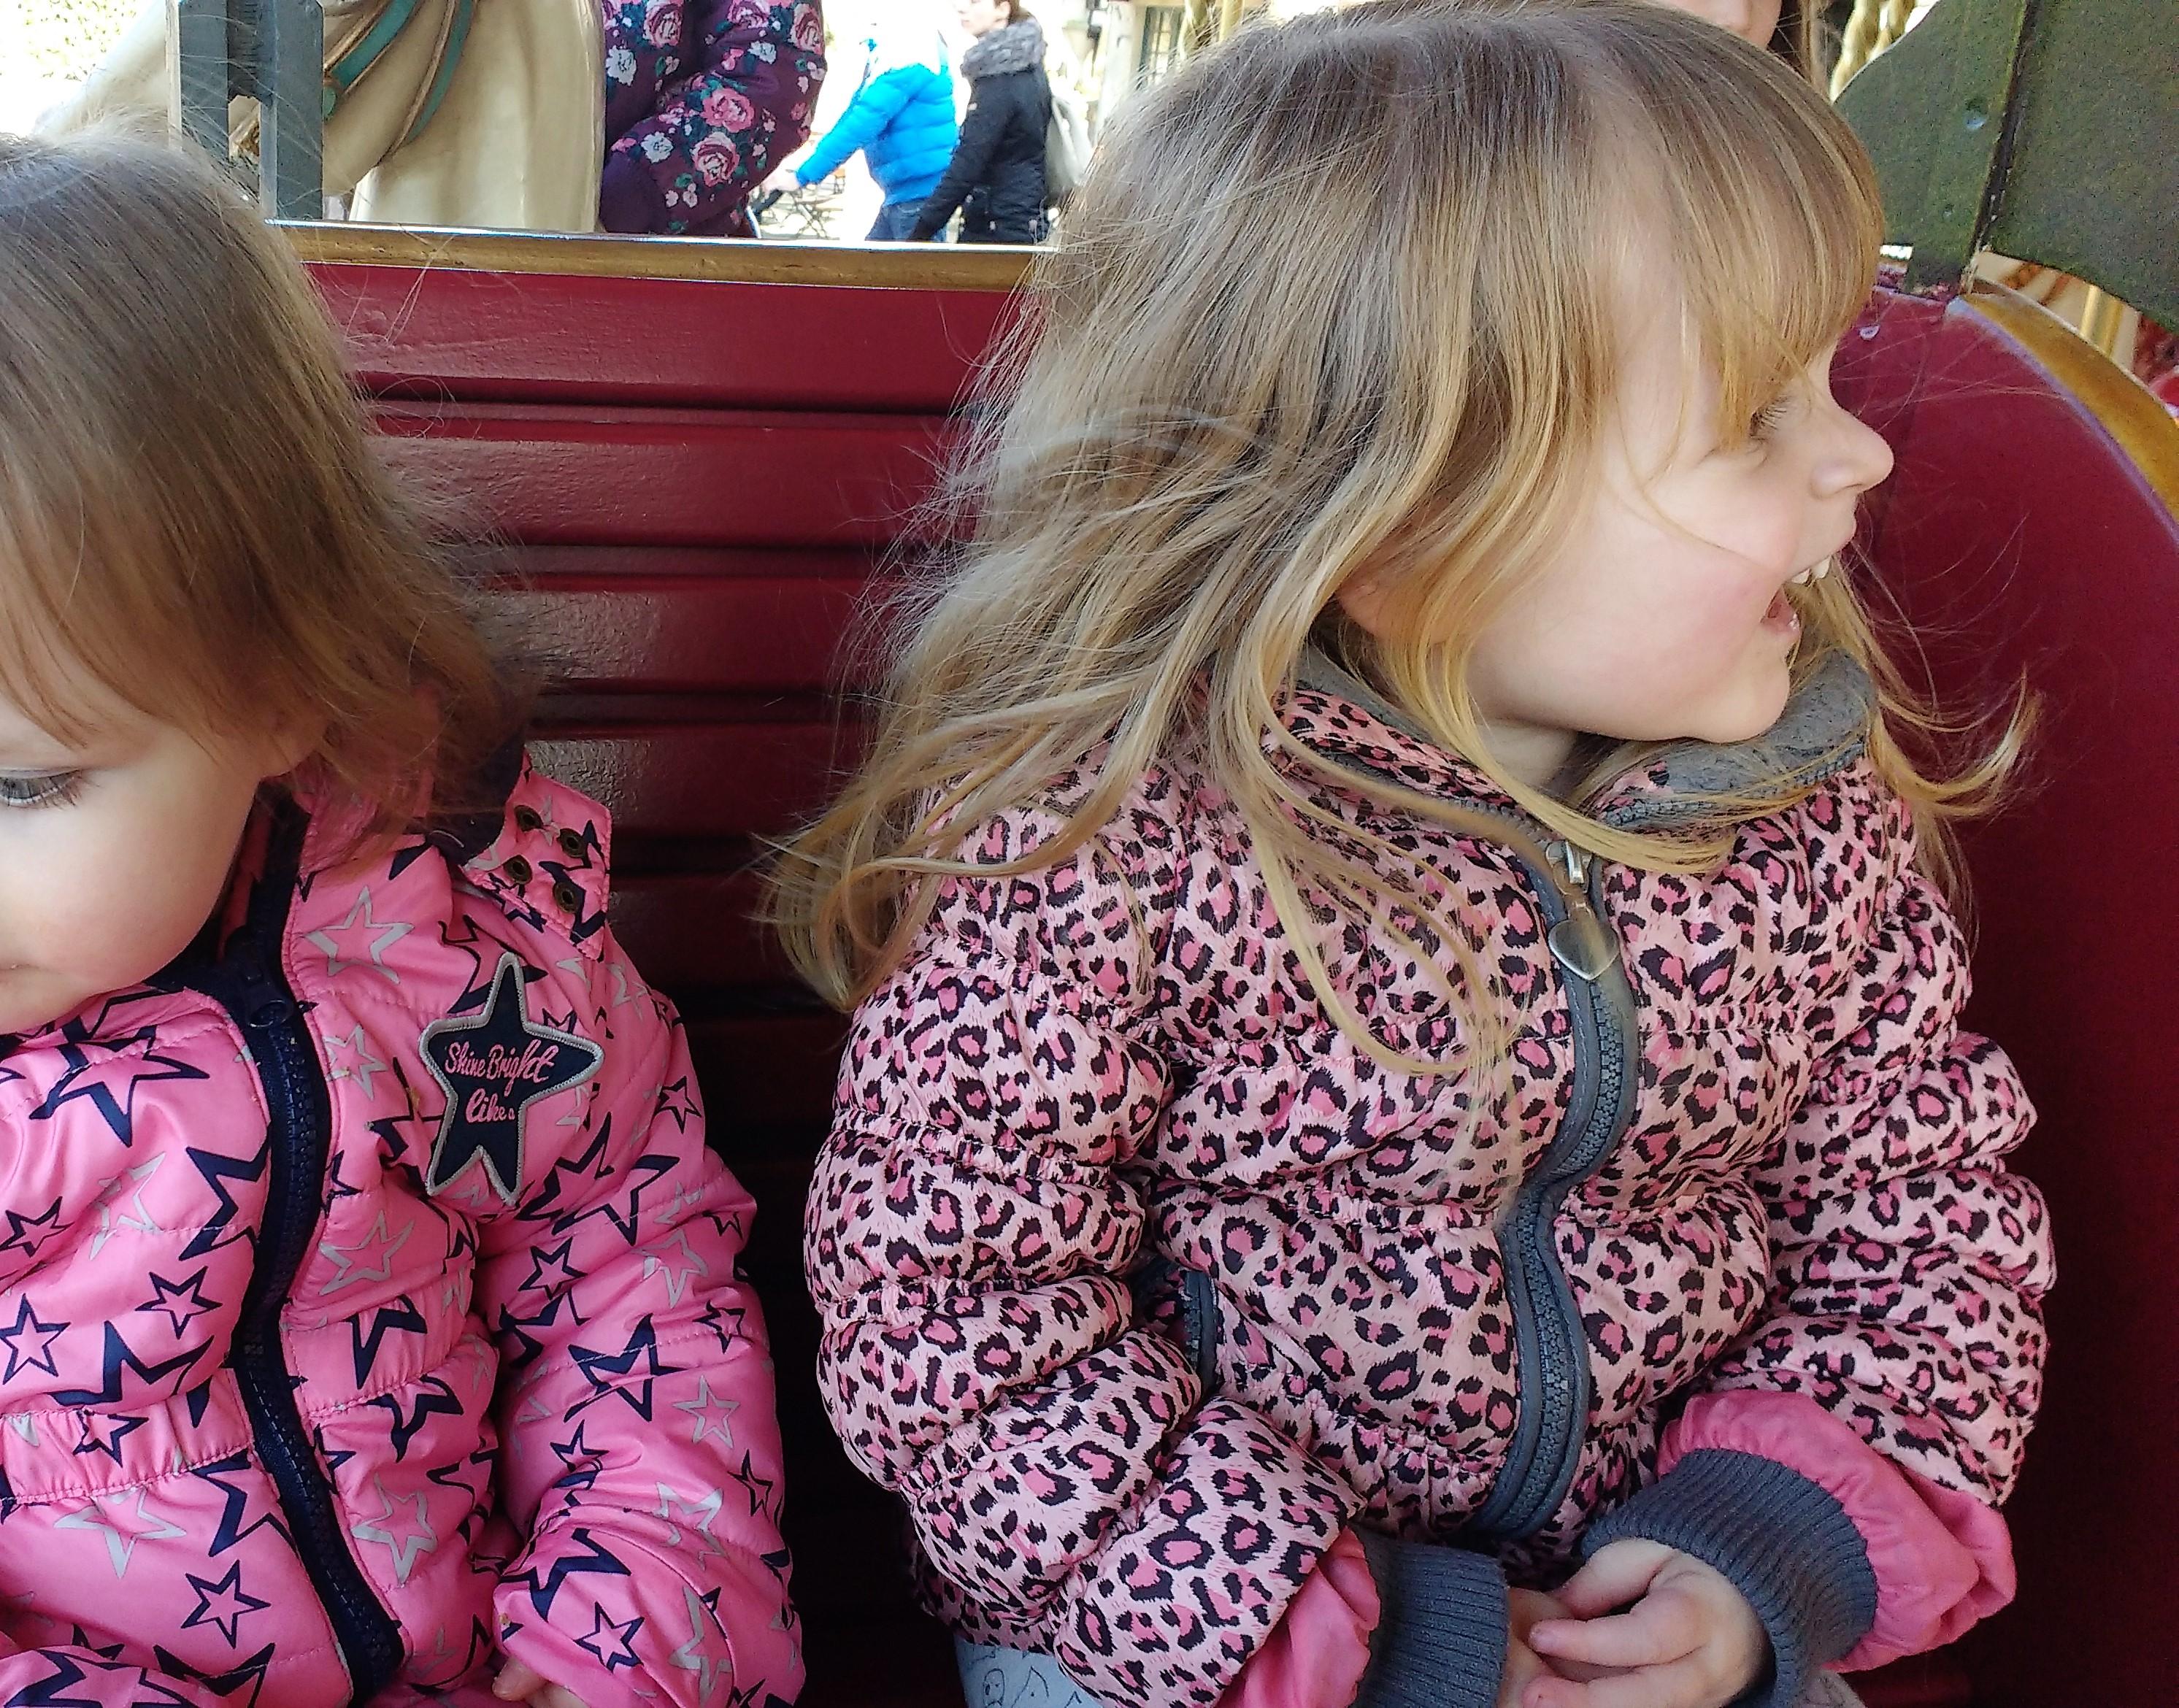 efteling, meisjesmama, meiden, kinderen, zusjes, dagje Efteling, blog, mamablog, lifestyleblog, La Log.nl